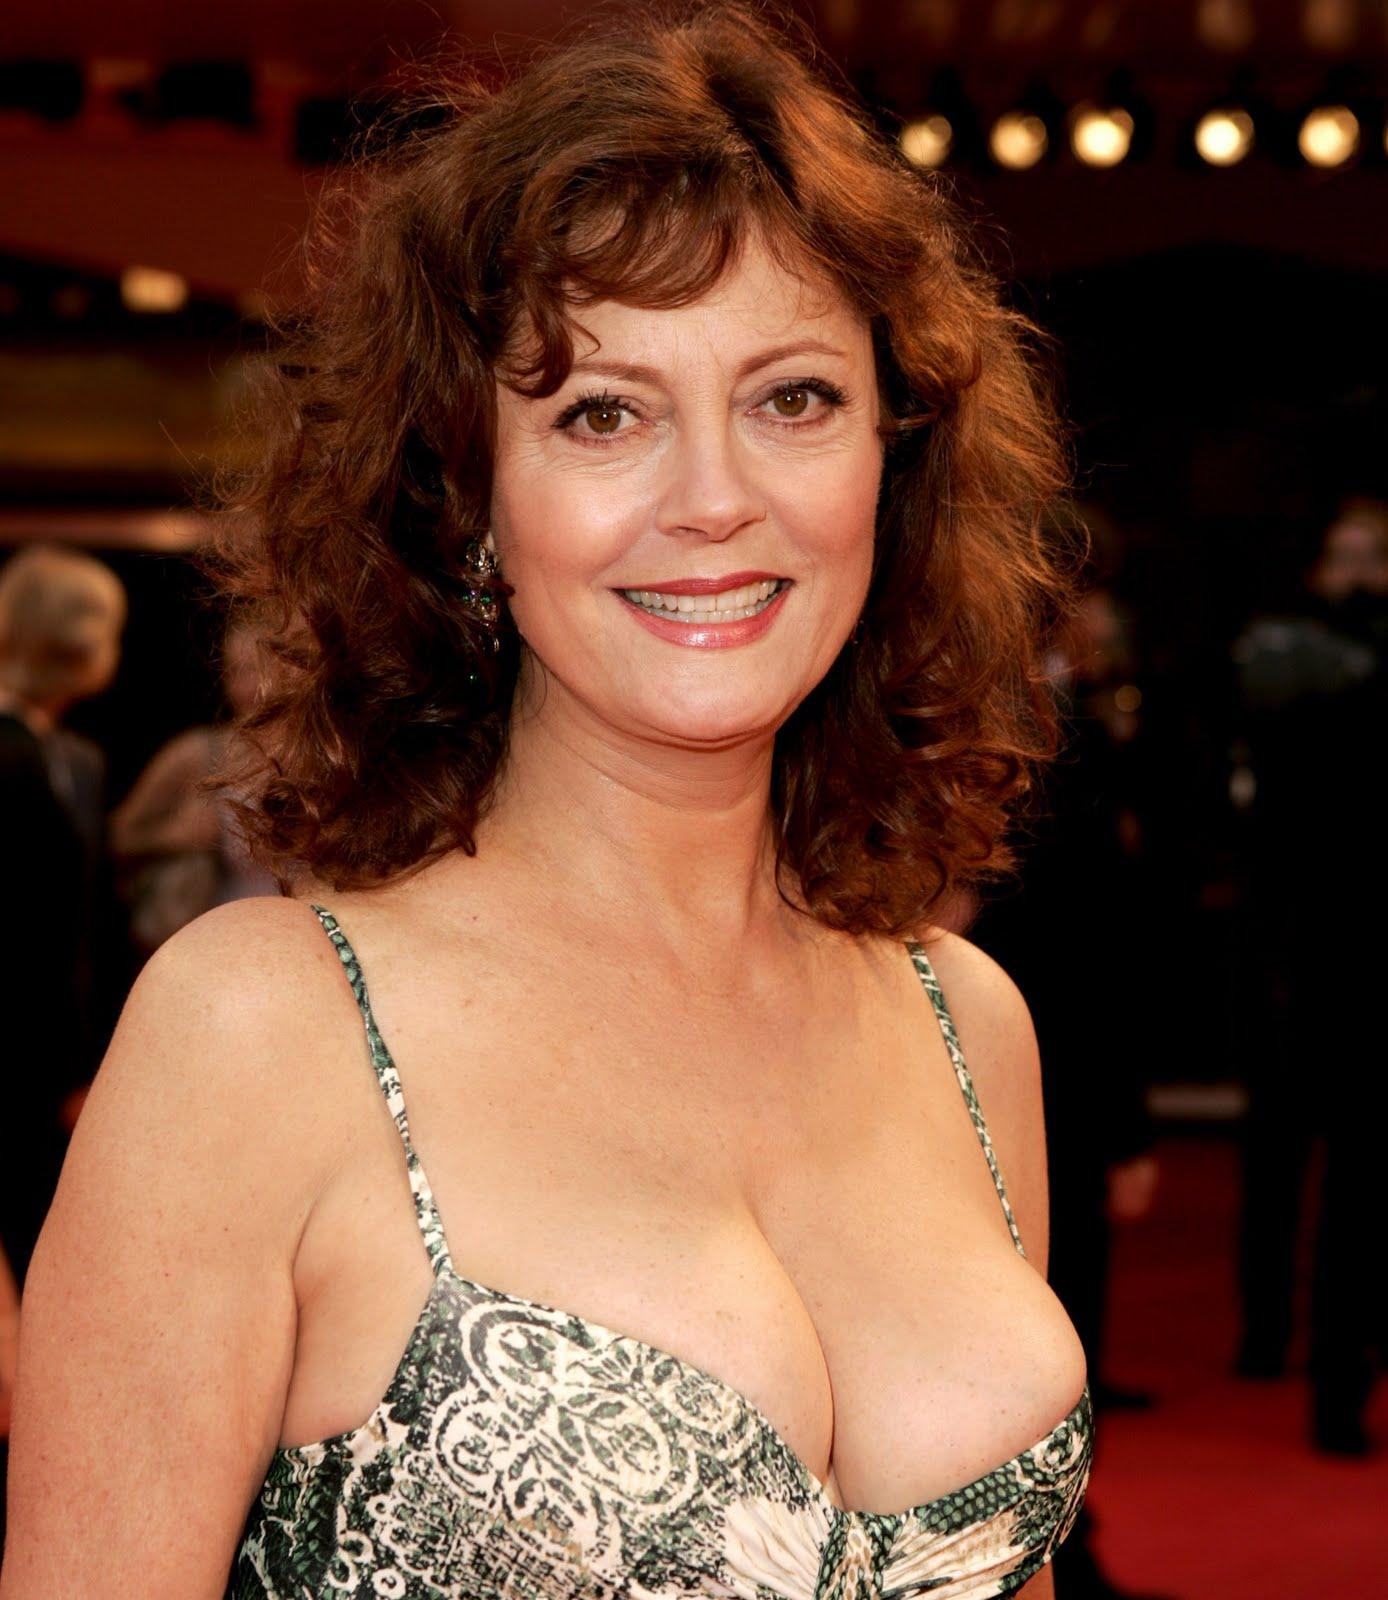 Celebrities Big boobs: Susan Sarandon - 95E